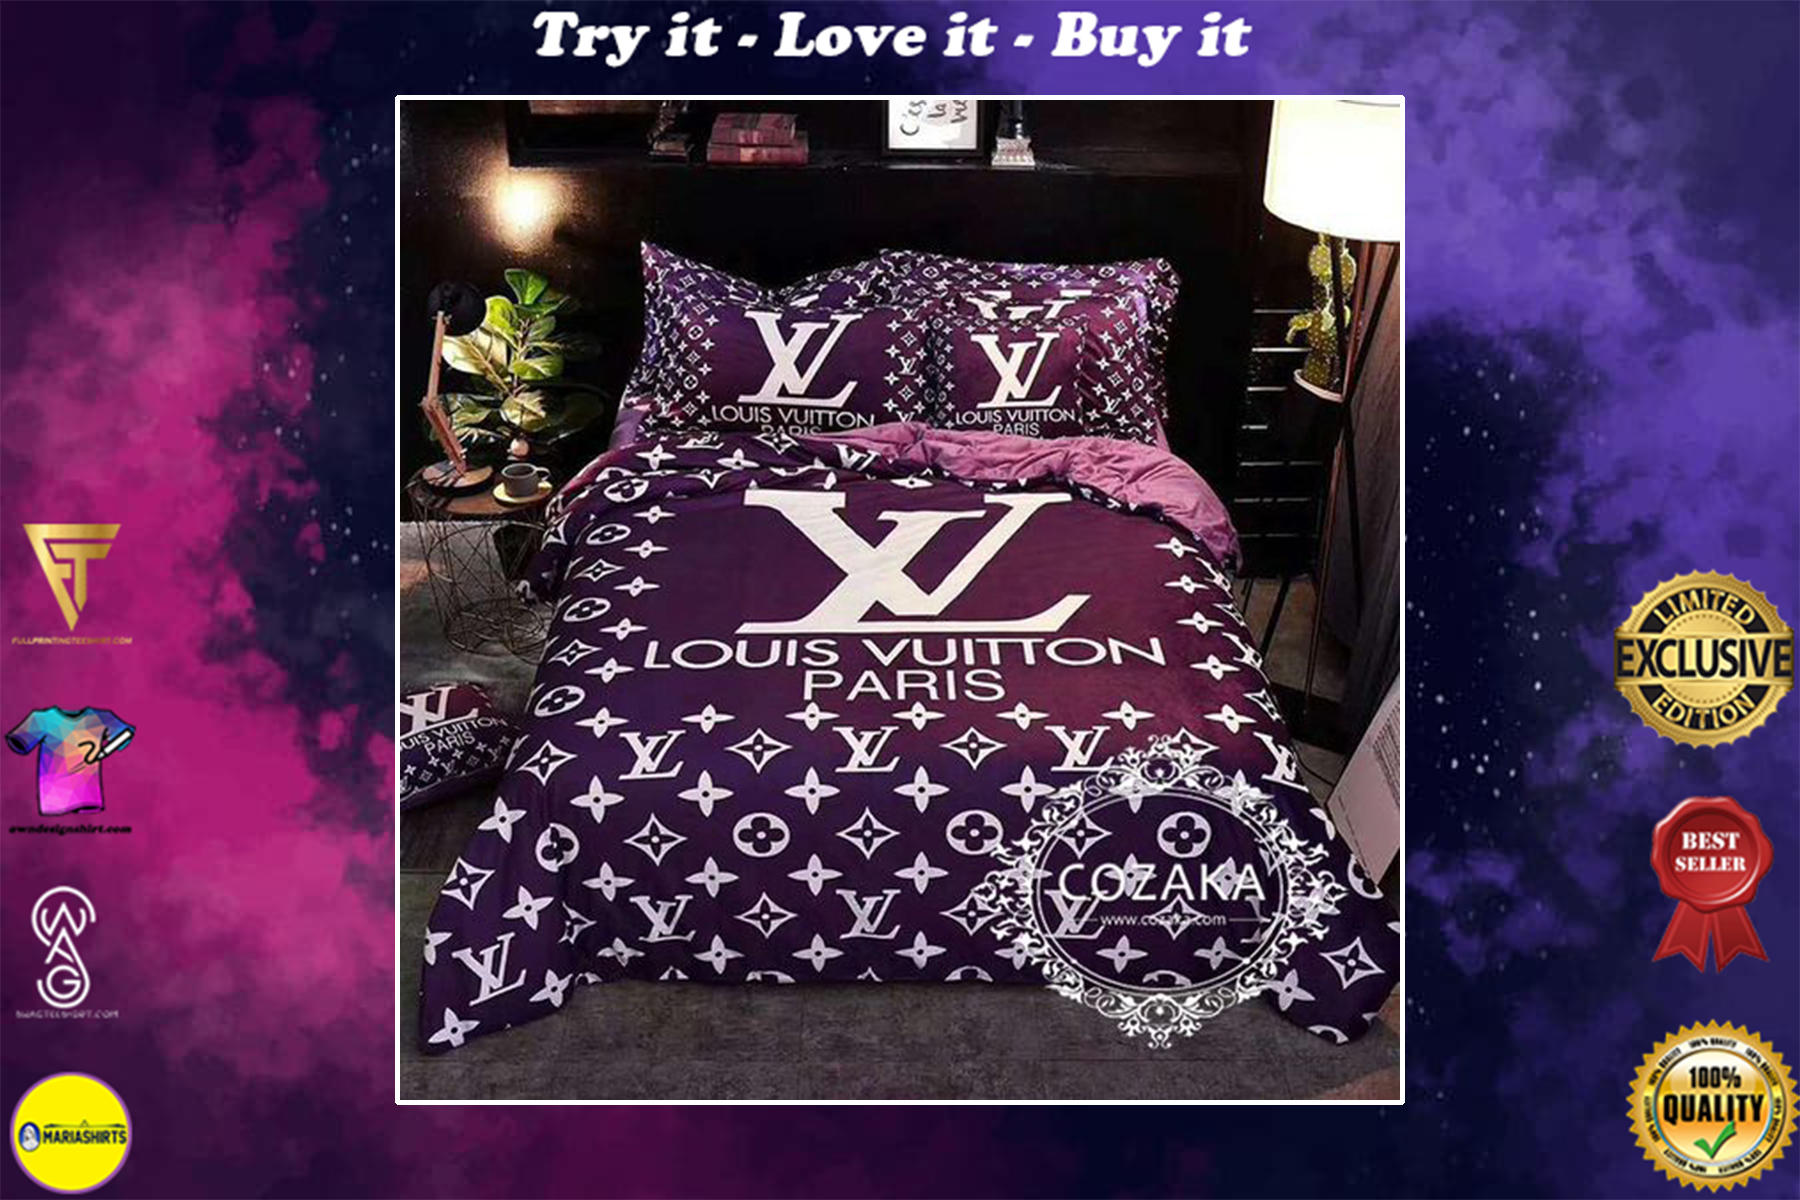 [special edition] louis vuitton paris monogram bedding set - maria